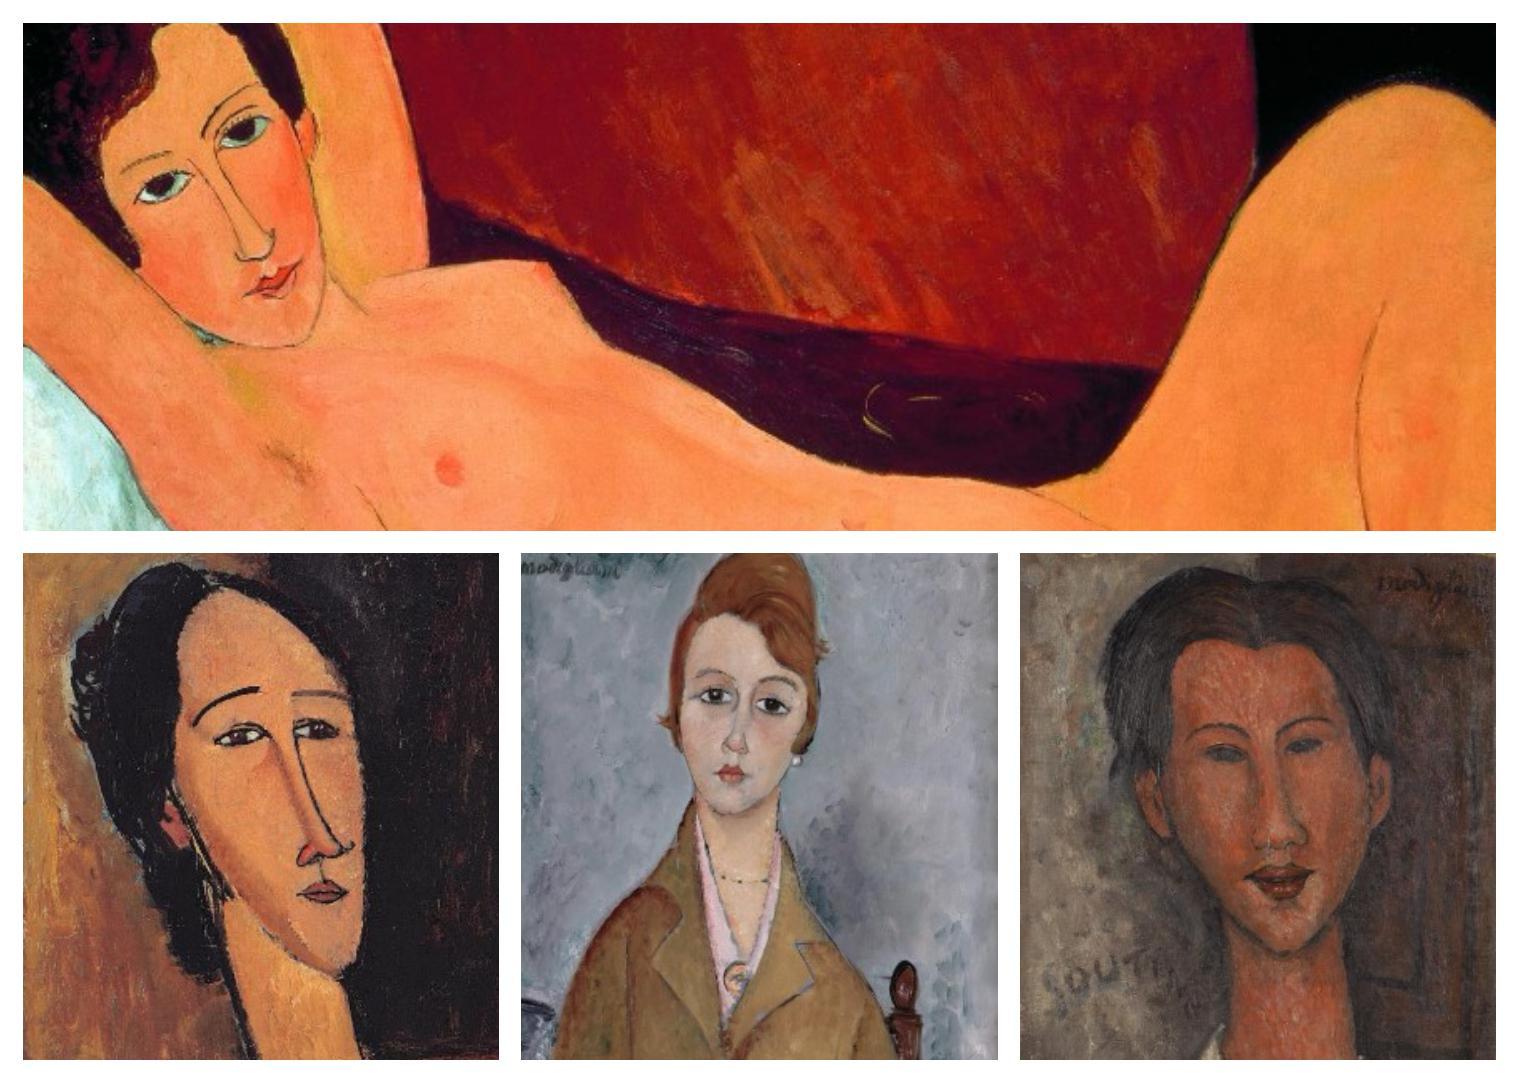 Una exposición mostró en Génova obras de Modigliani